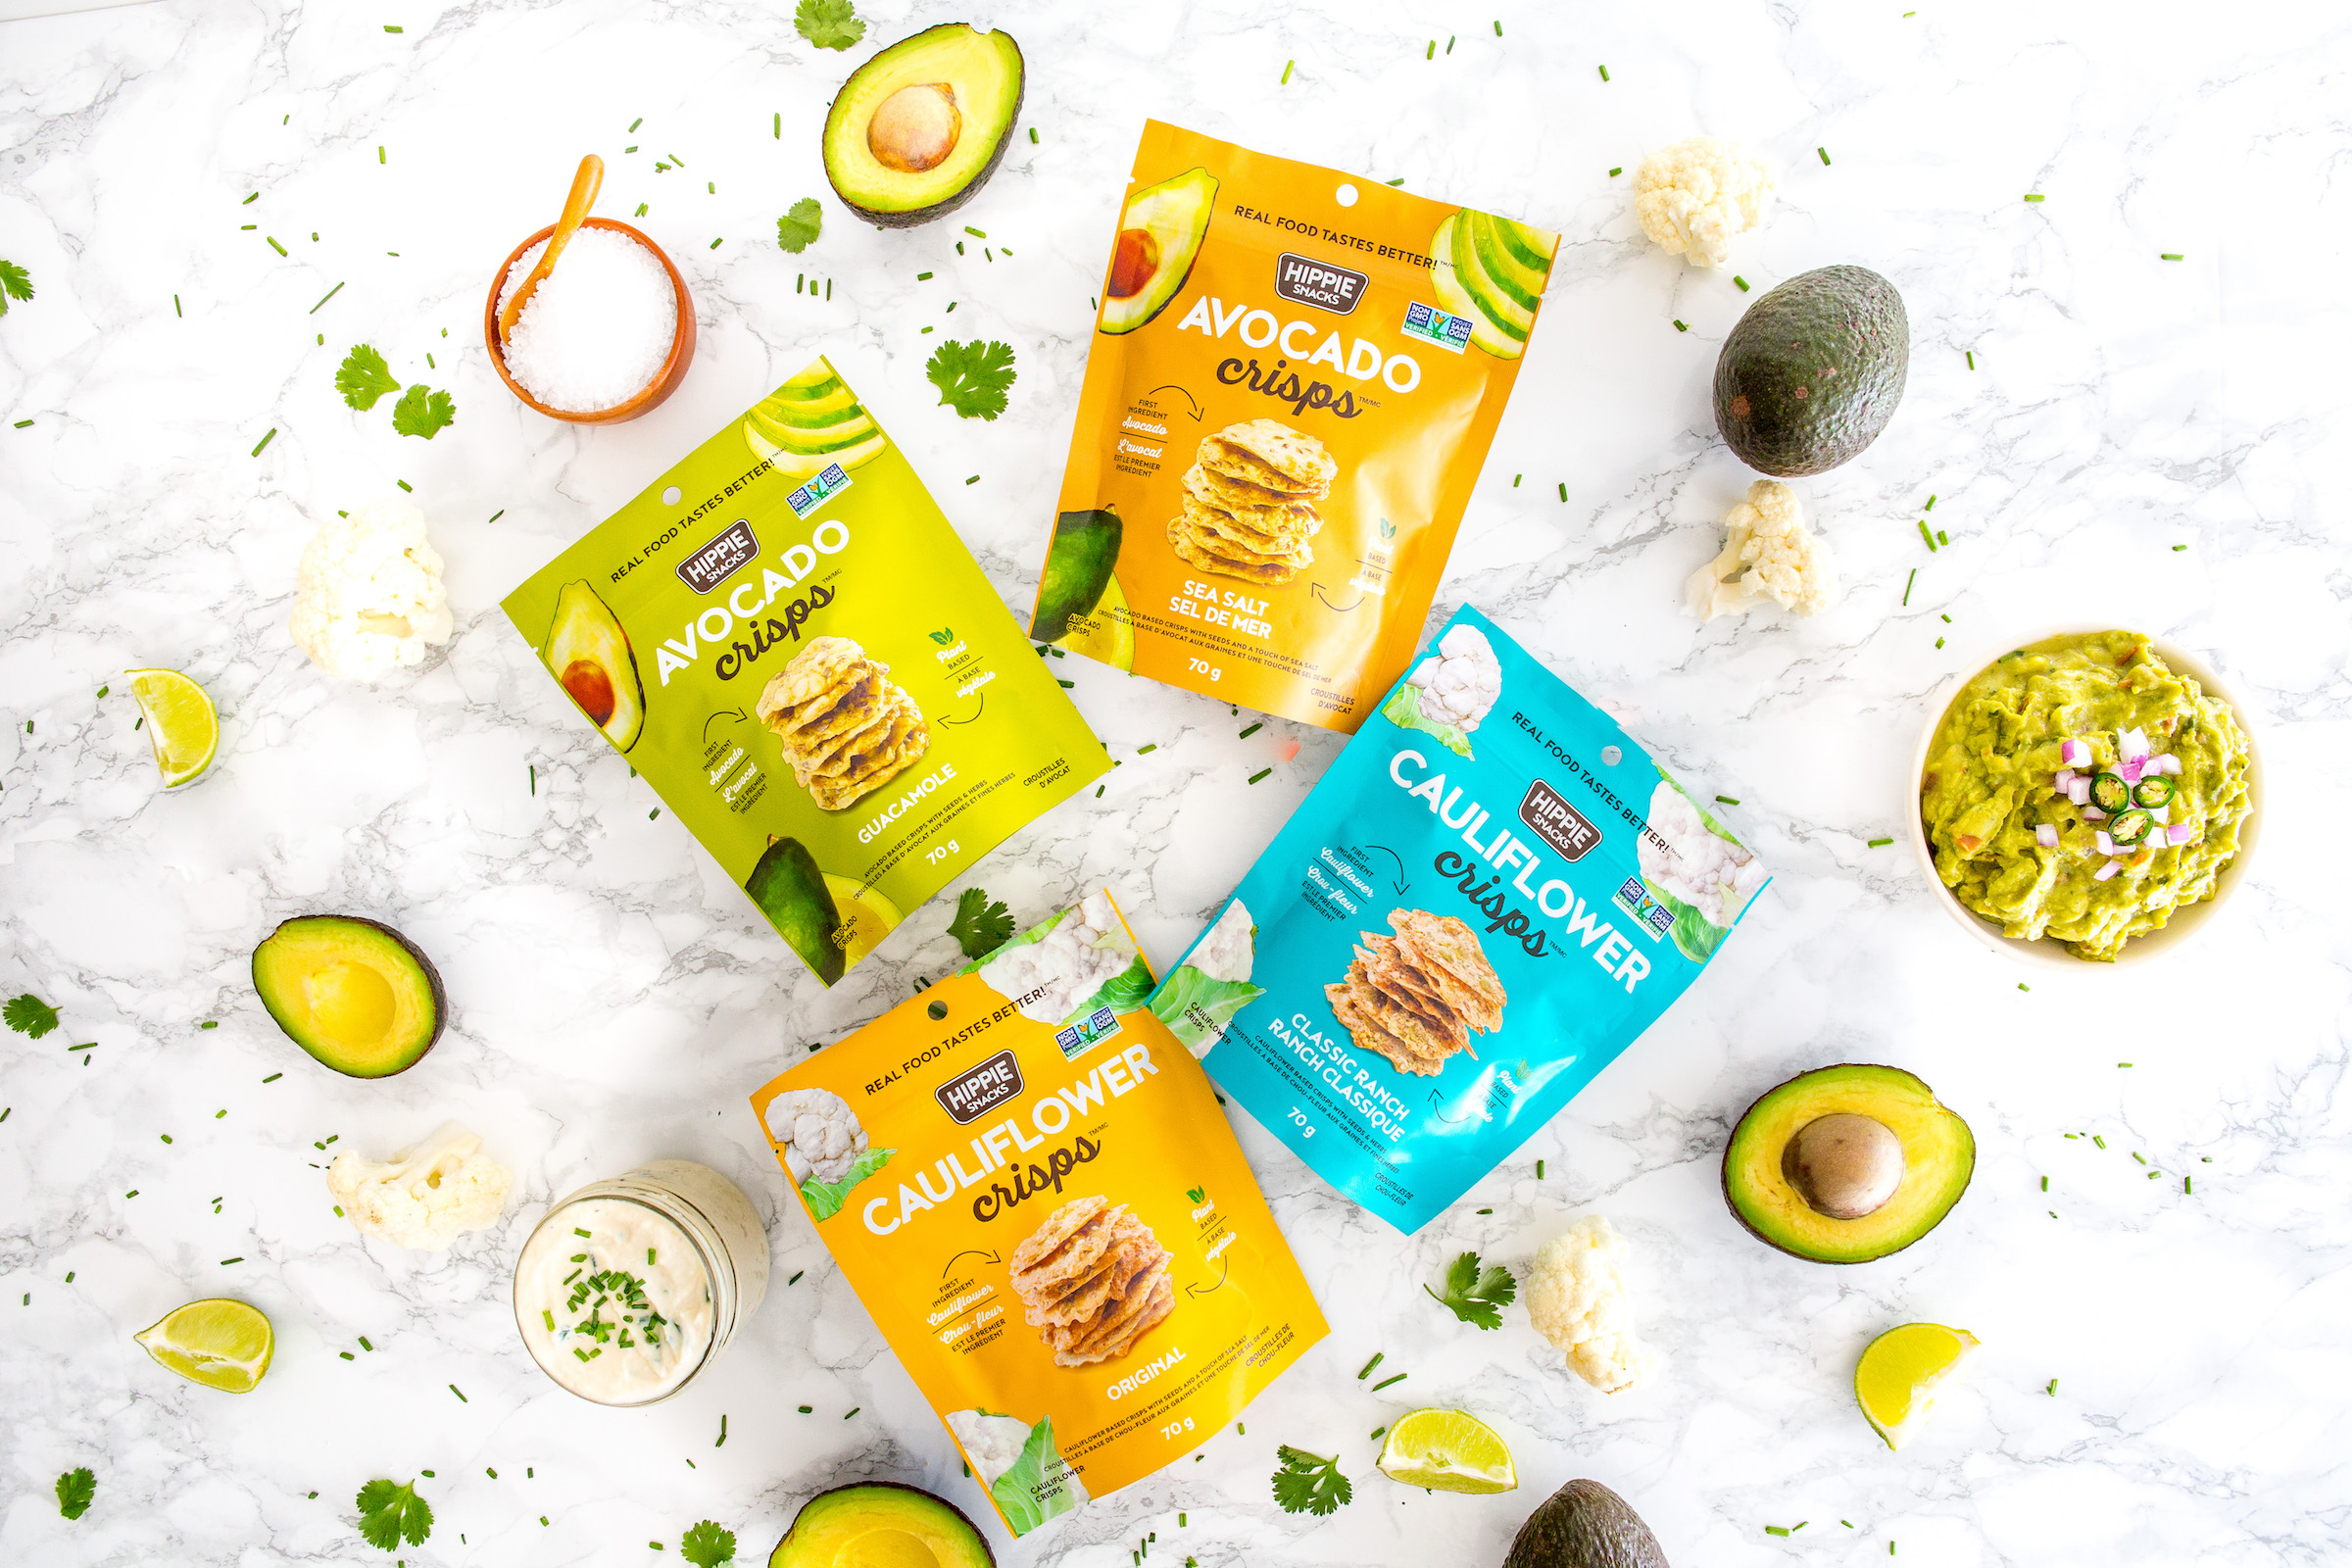 Hippie Snacks Launches New Cauliflower Crisps and Avocado Crisps Inbox x